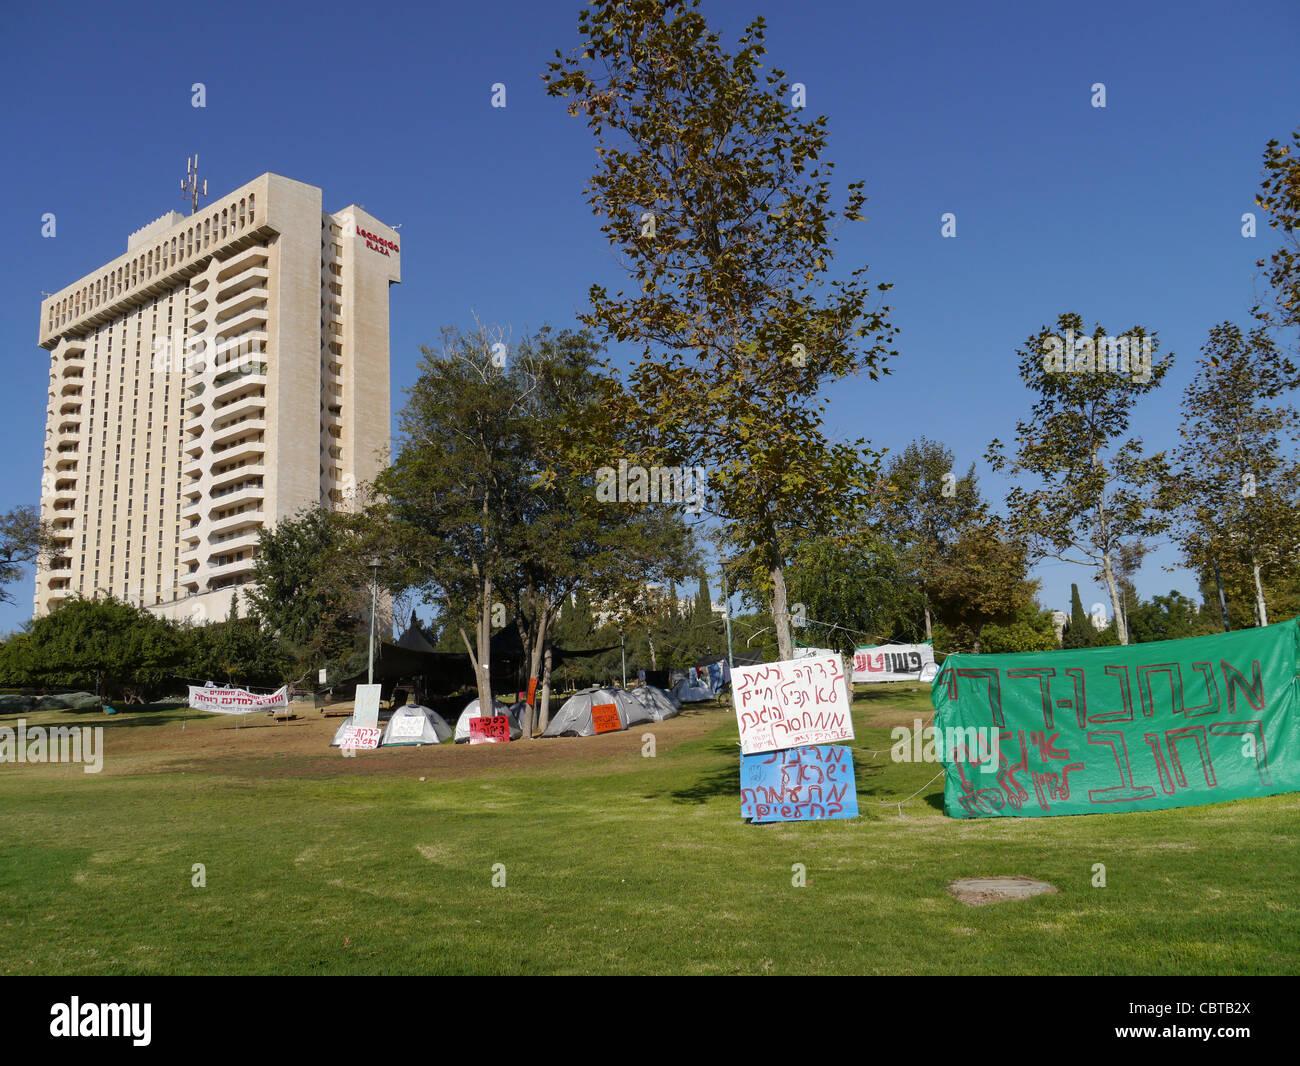 Anti-povertà protesta camp in Gerusalemme Immagini Stock